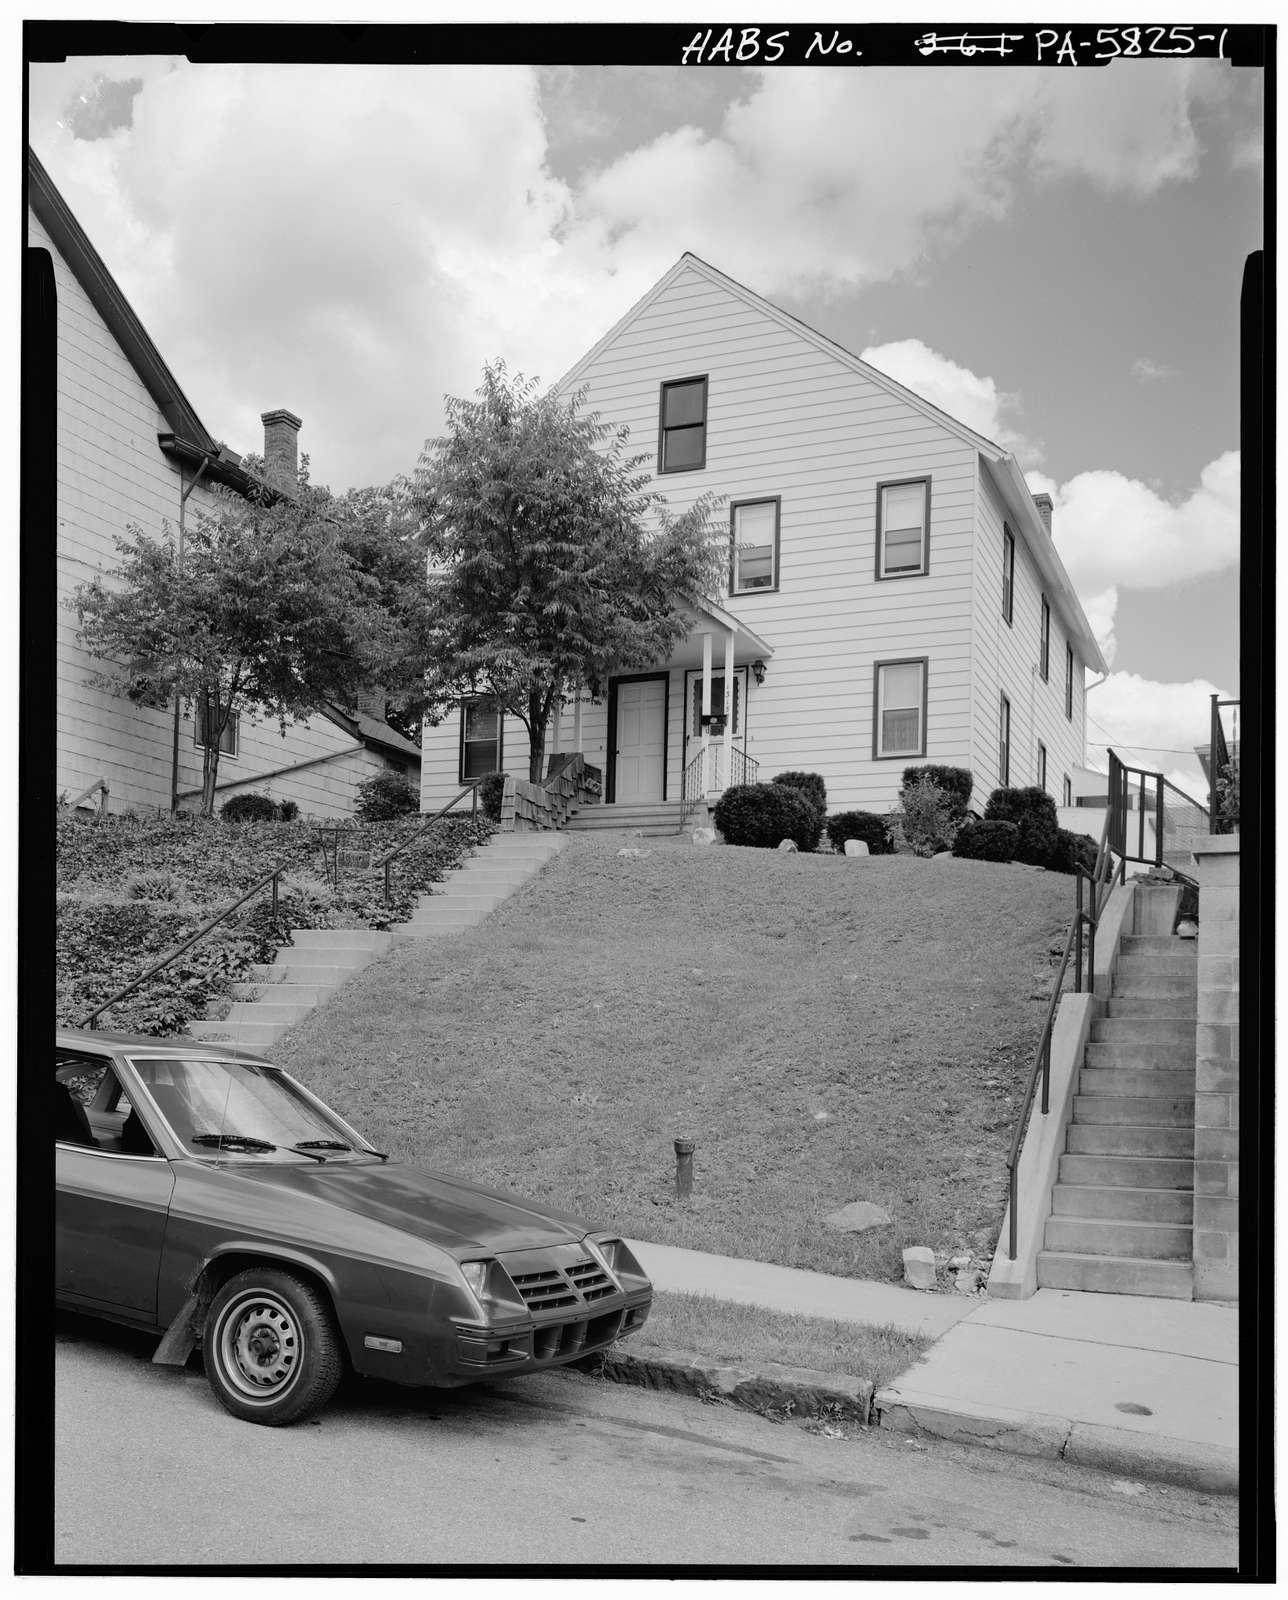 Maennerchor Singing Society Hall, 1313-1315 Second Avenue, Altoona, Blair County, PA